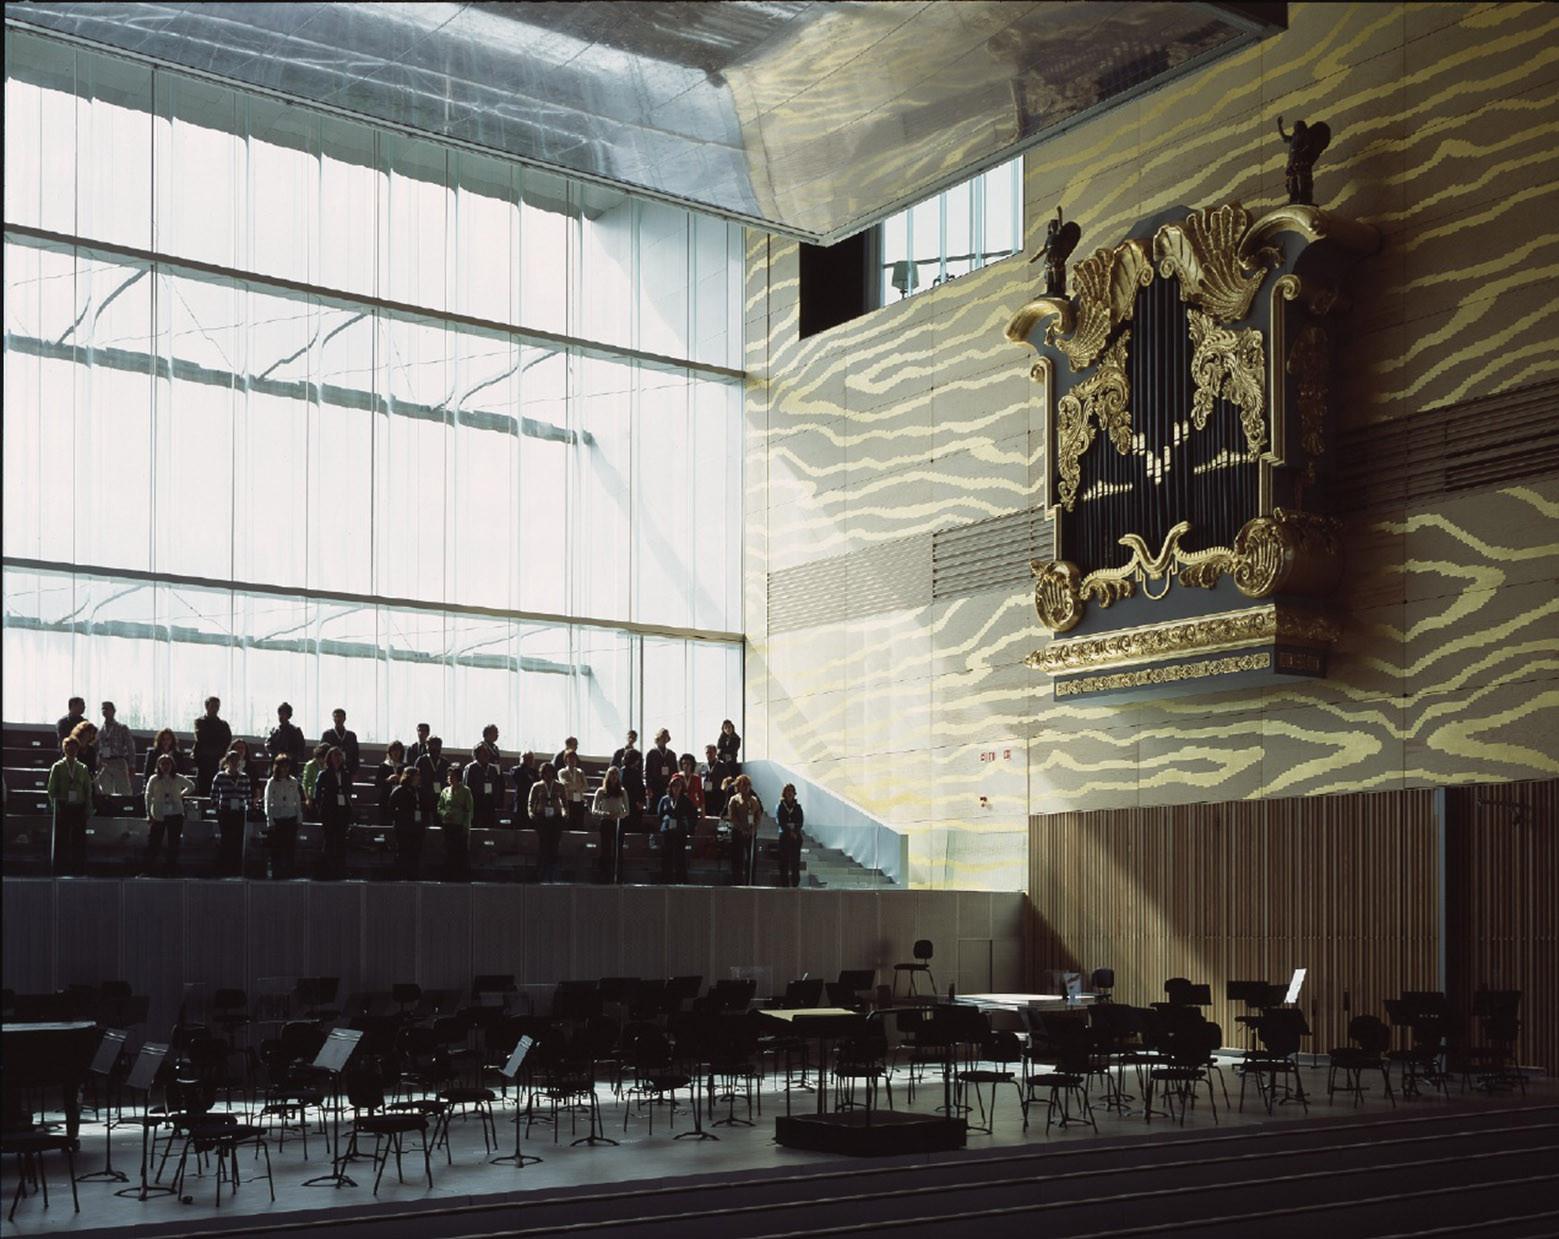 Casa da musica oma archdaily for Casa de musica temuco